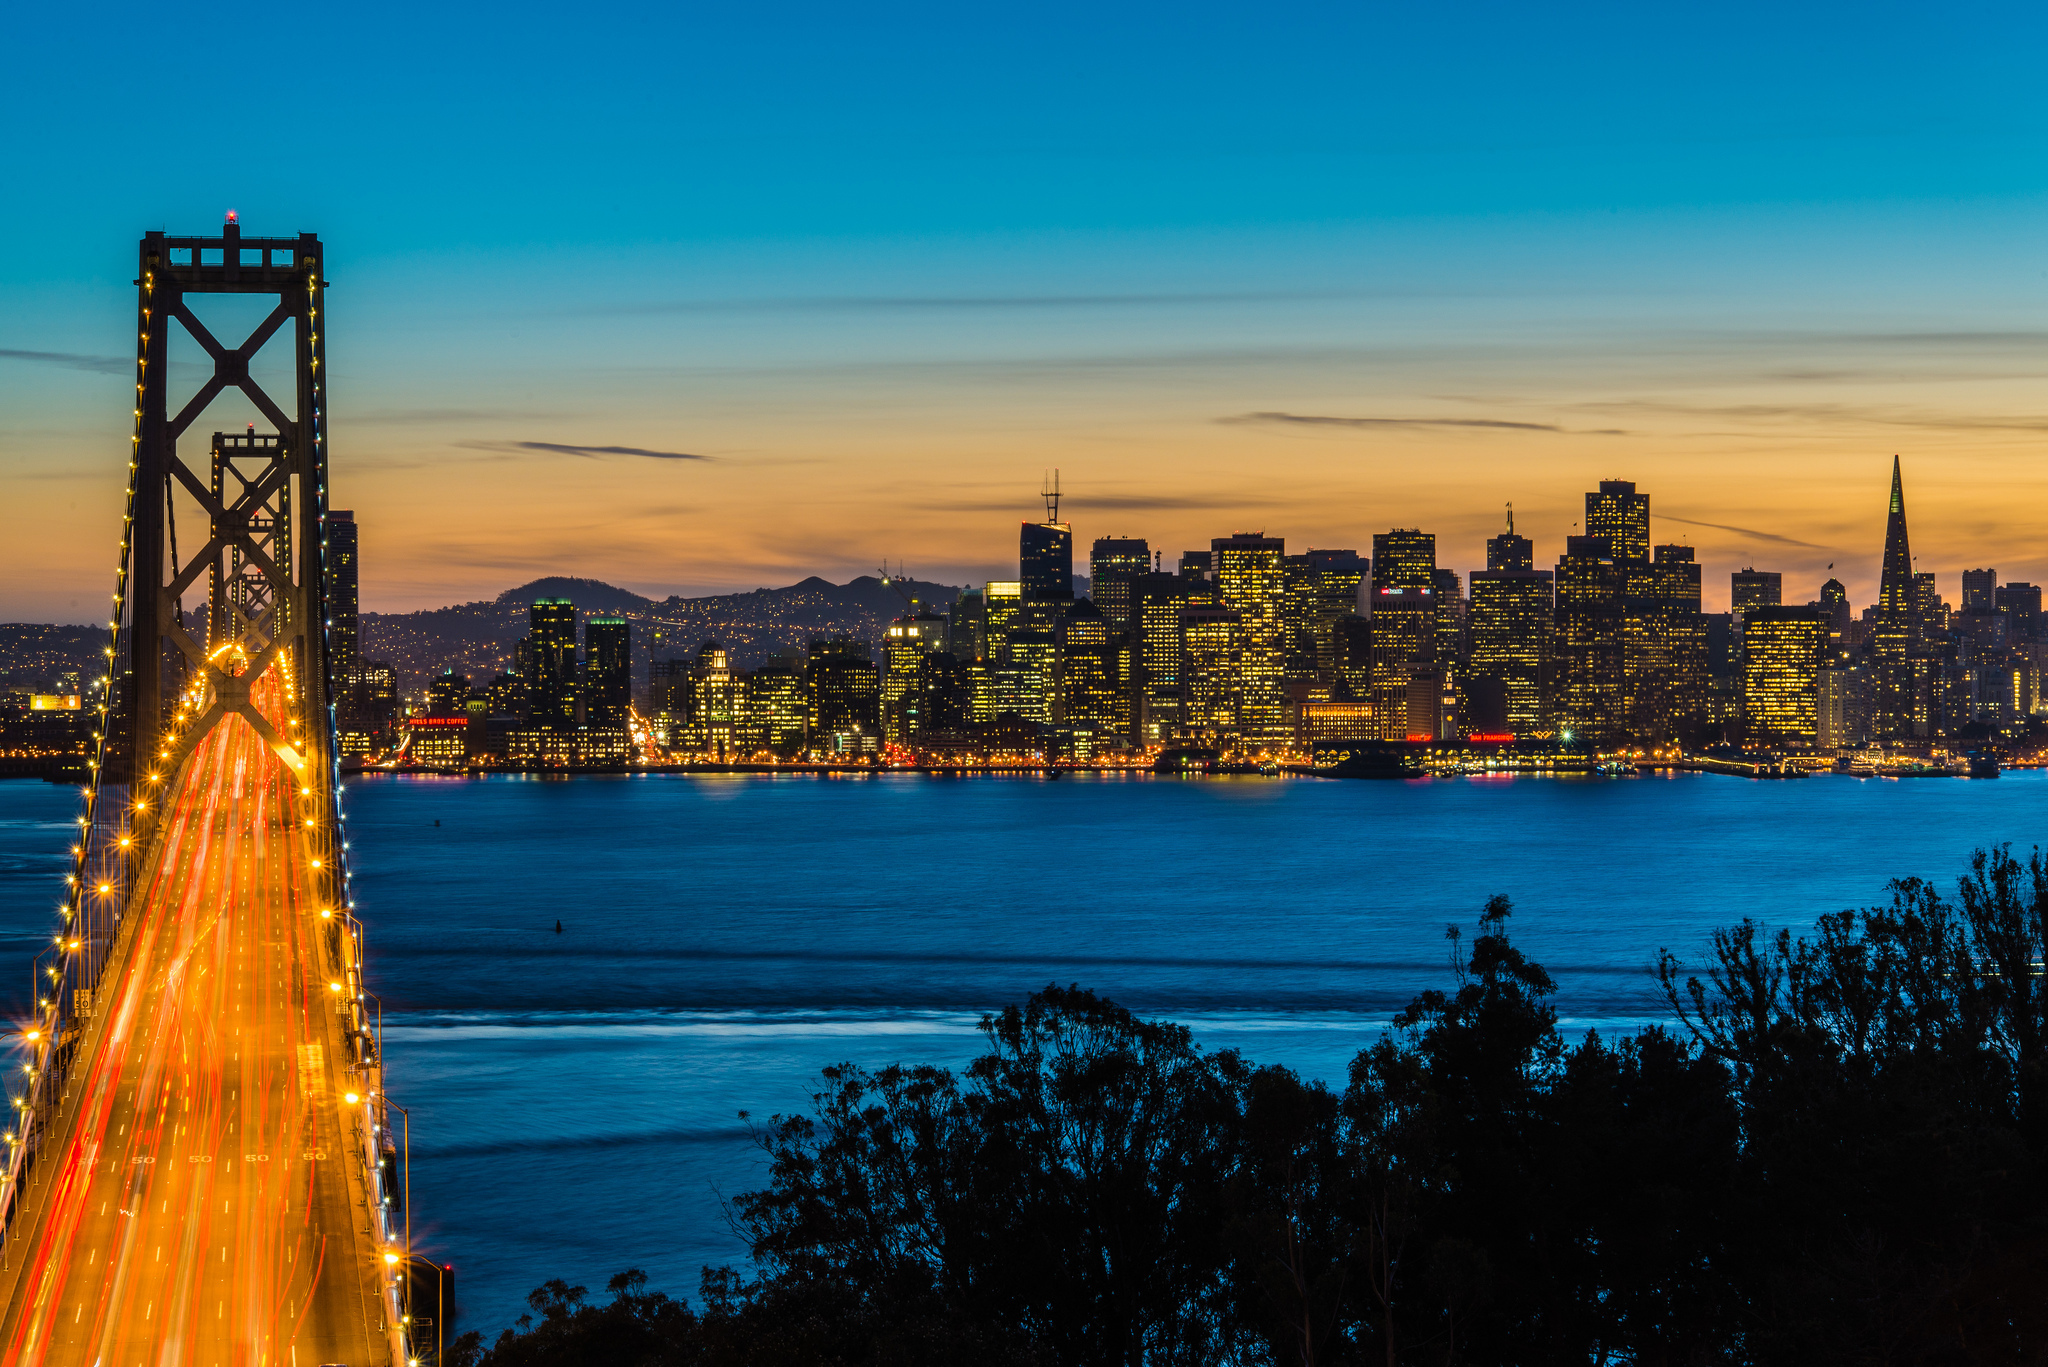 Evening Crossing, Bay Bridge, San Francisco, California  № 3720945  скачать